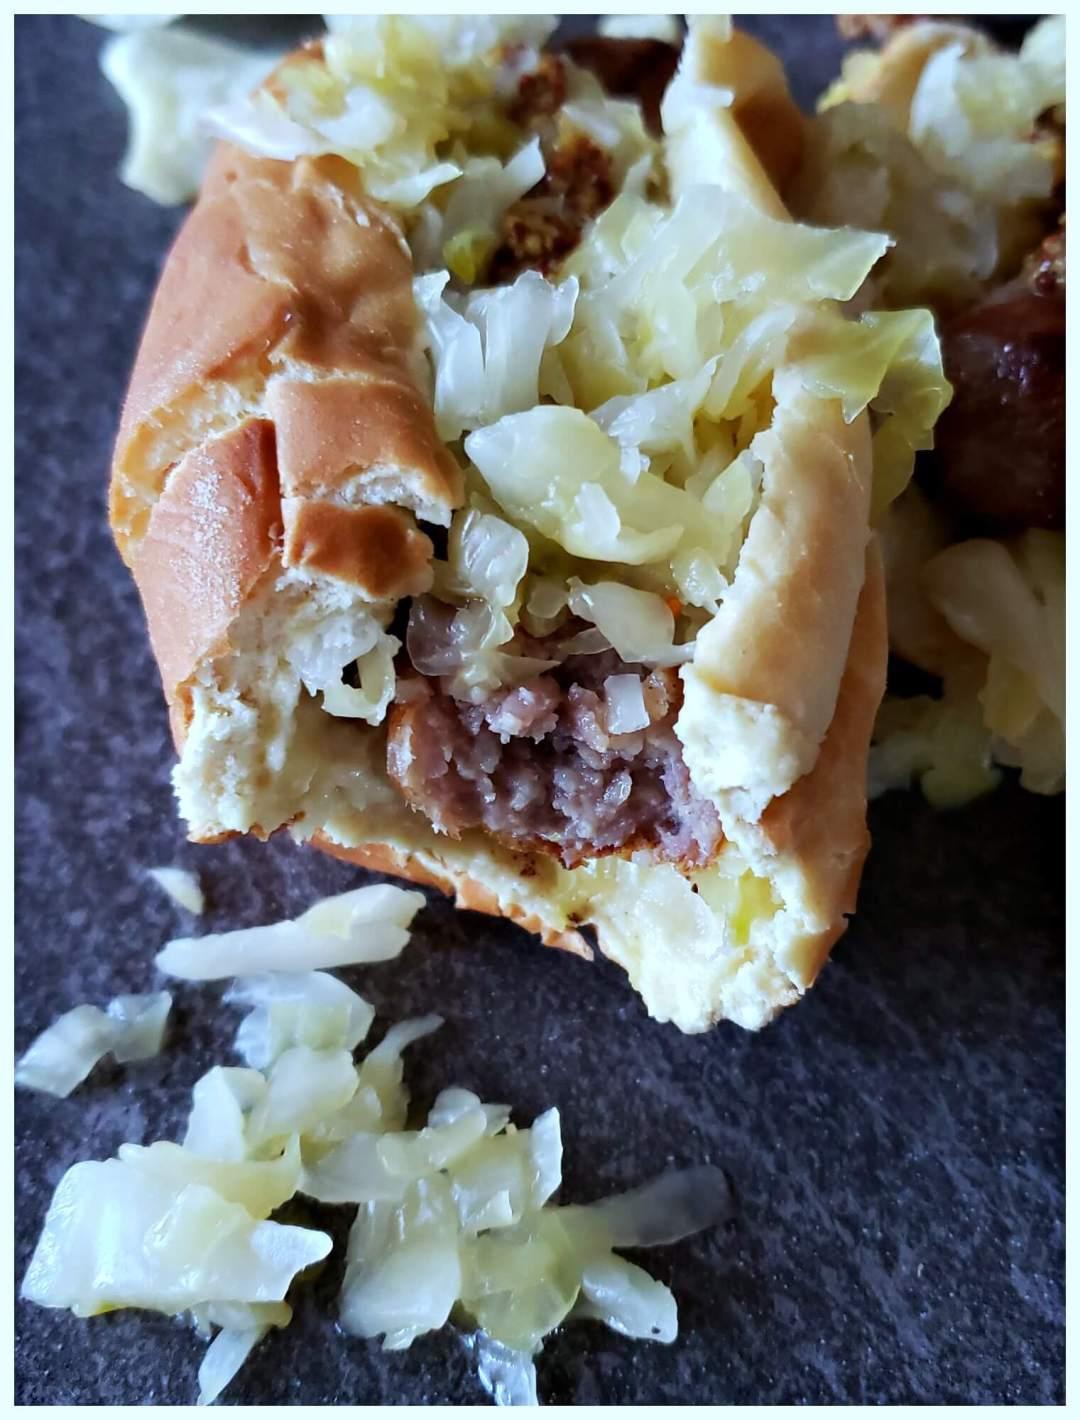 Incredible bratwurst recipe